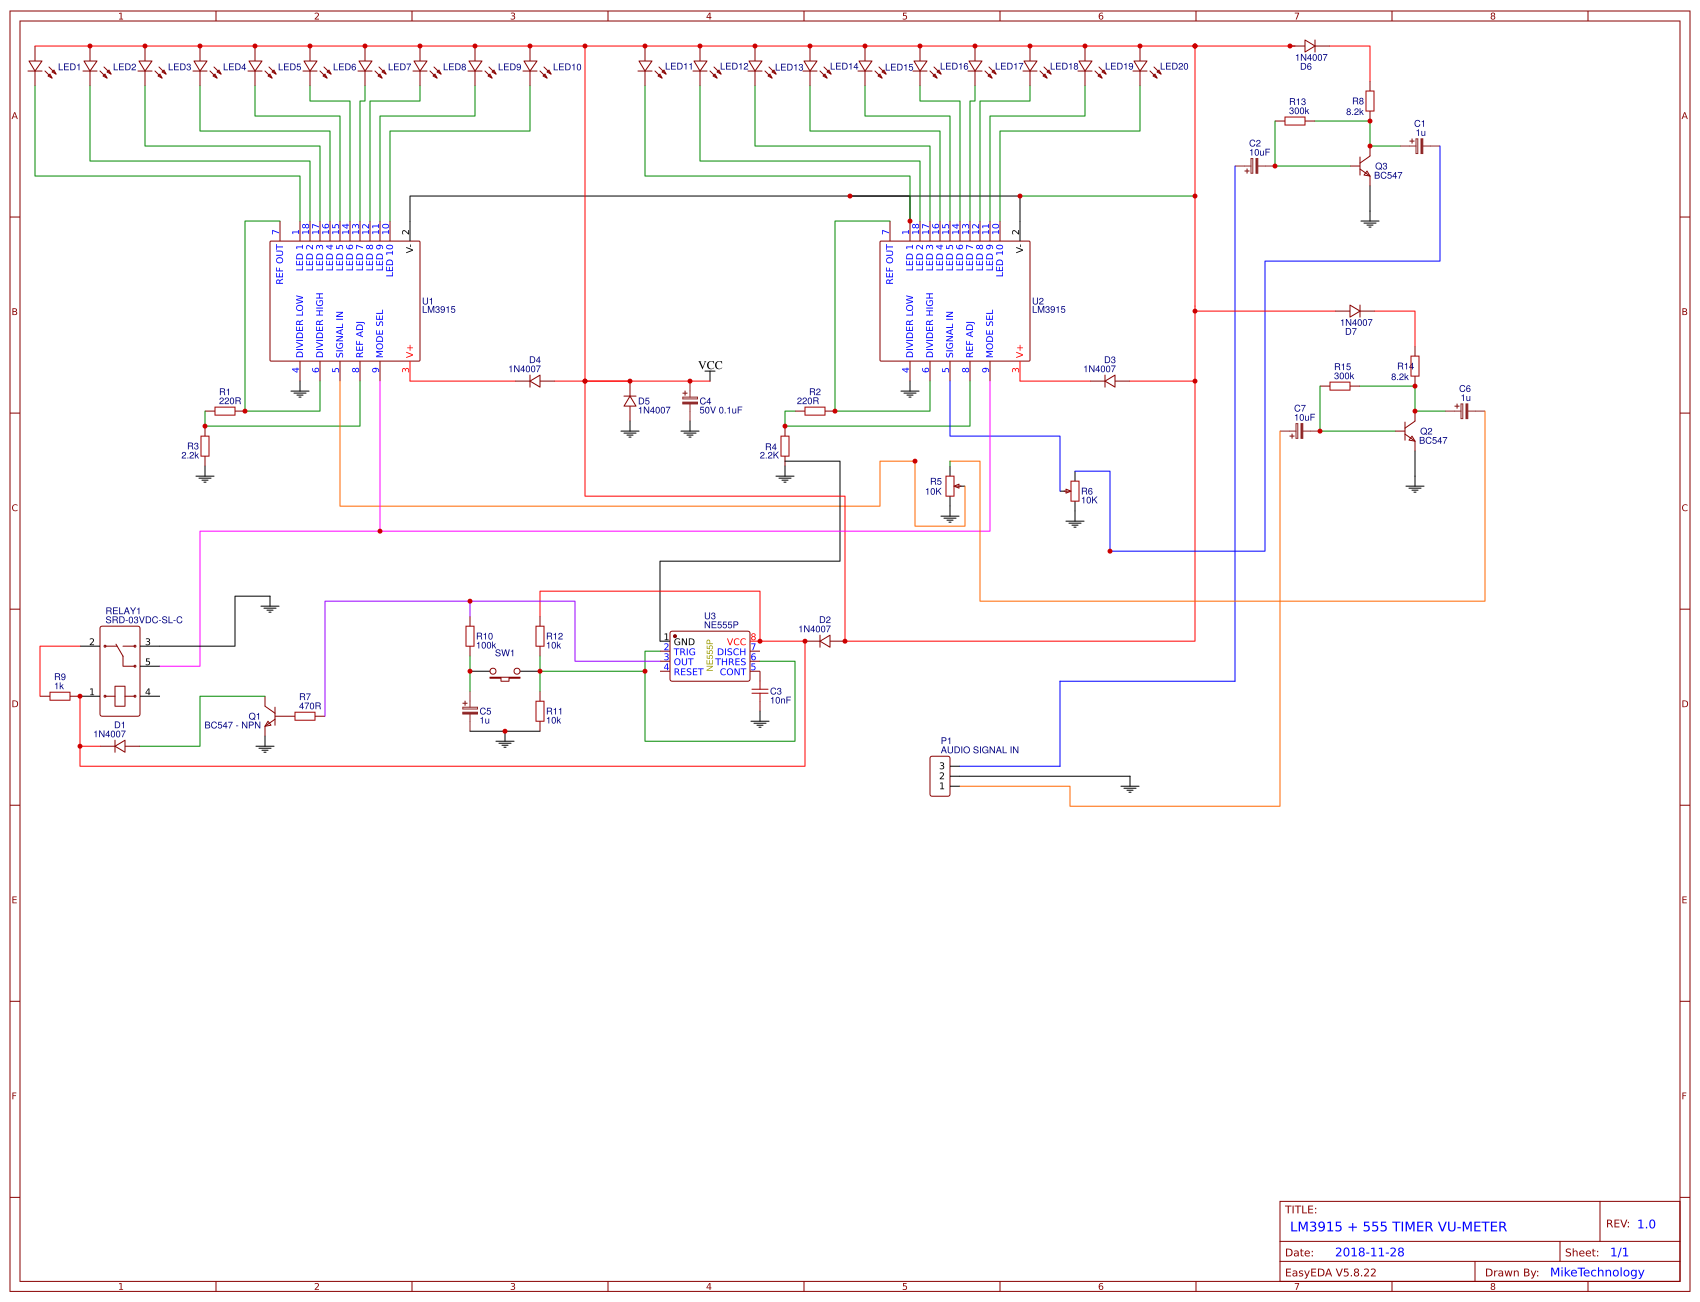 Lm3915 555 Timer Vu Meter Easyeda Operating Modes Sheet 1